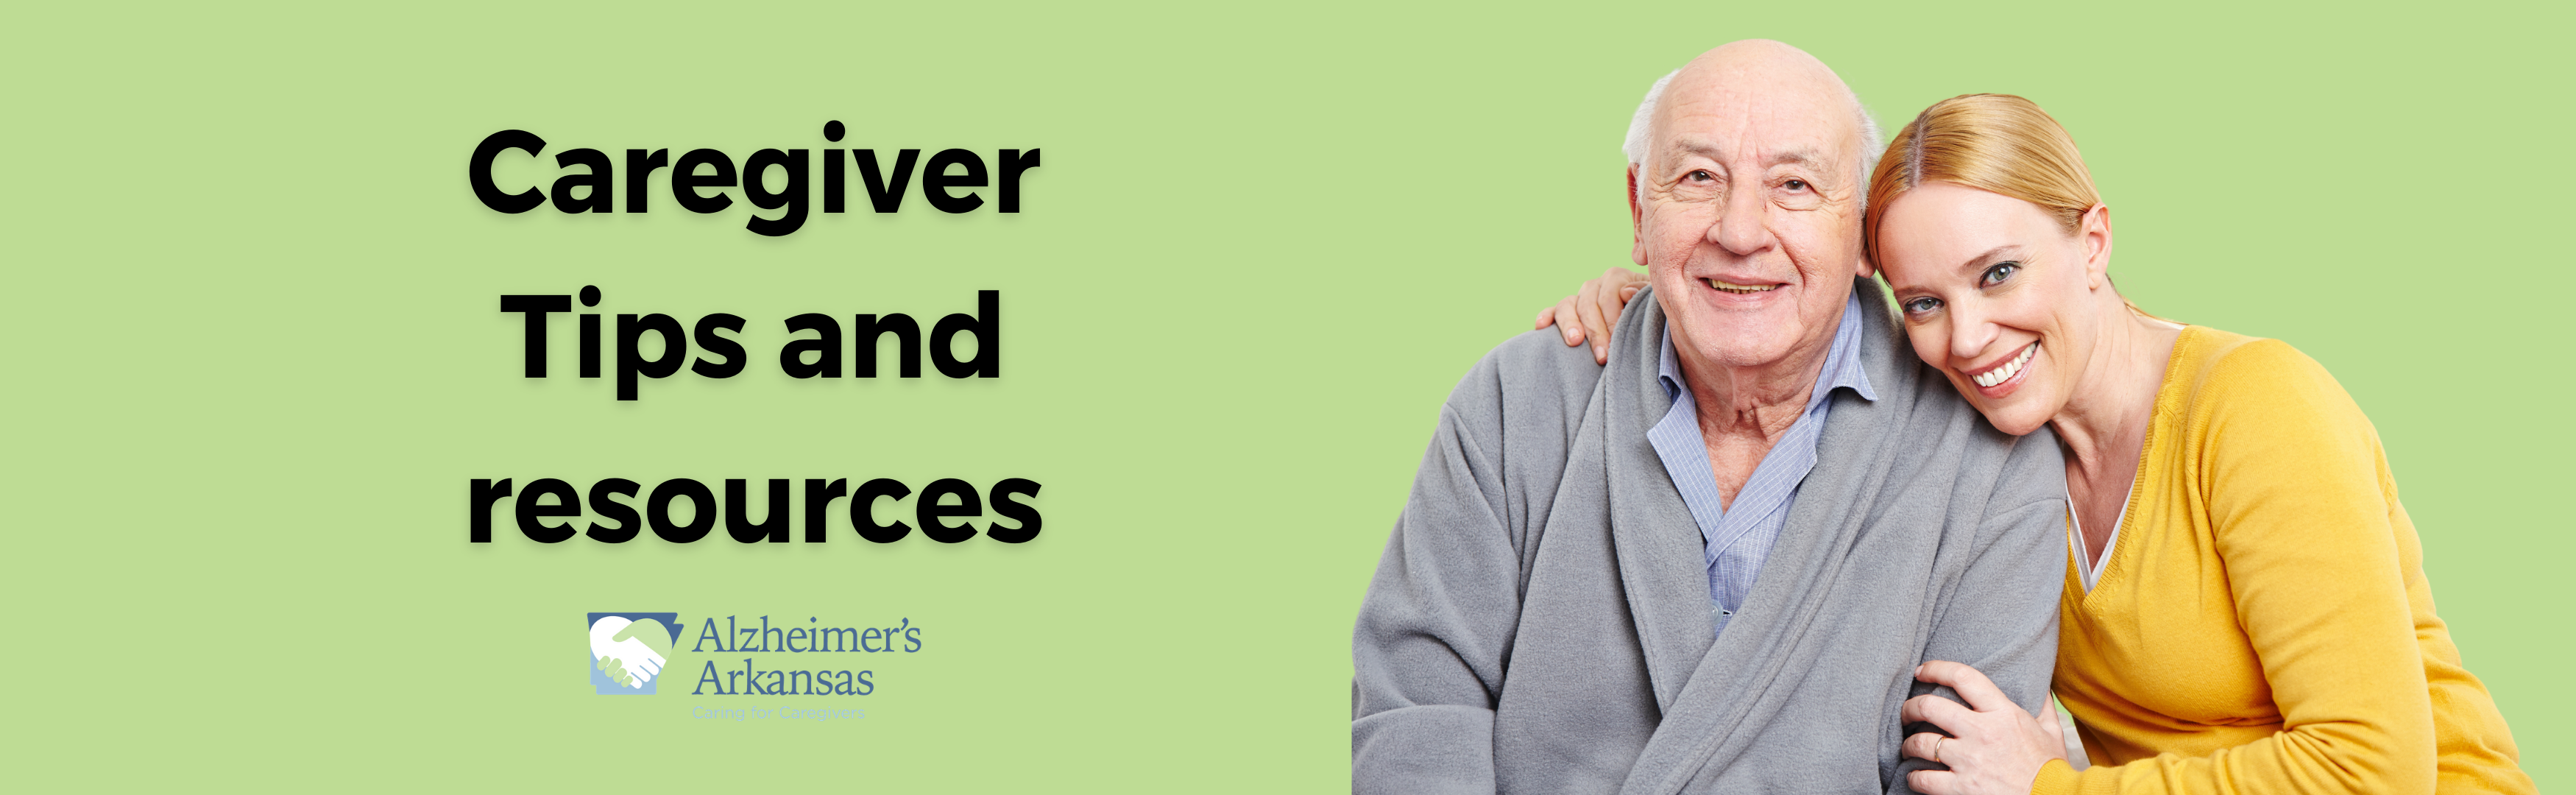 Caregiver Tips for National Family Caregiver Month